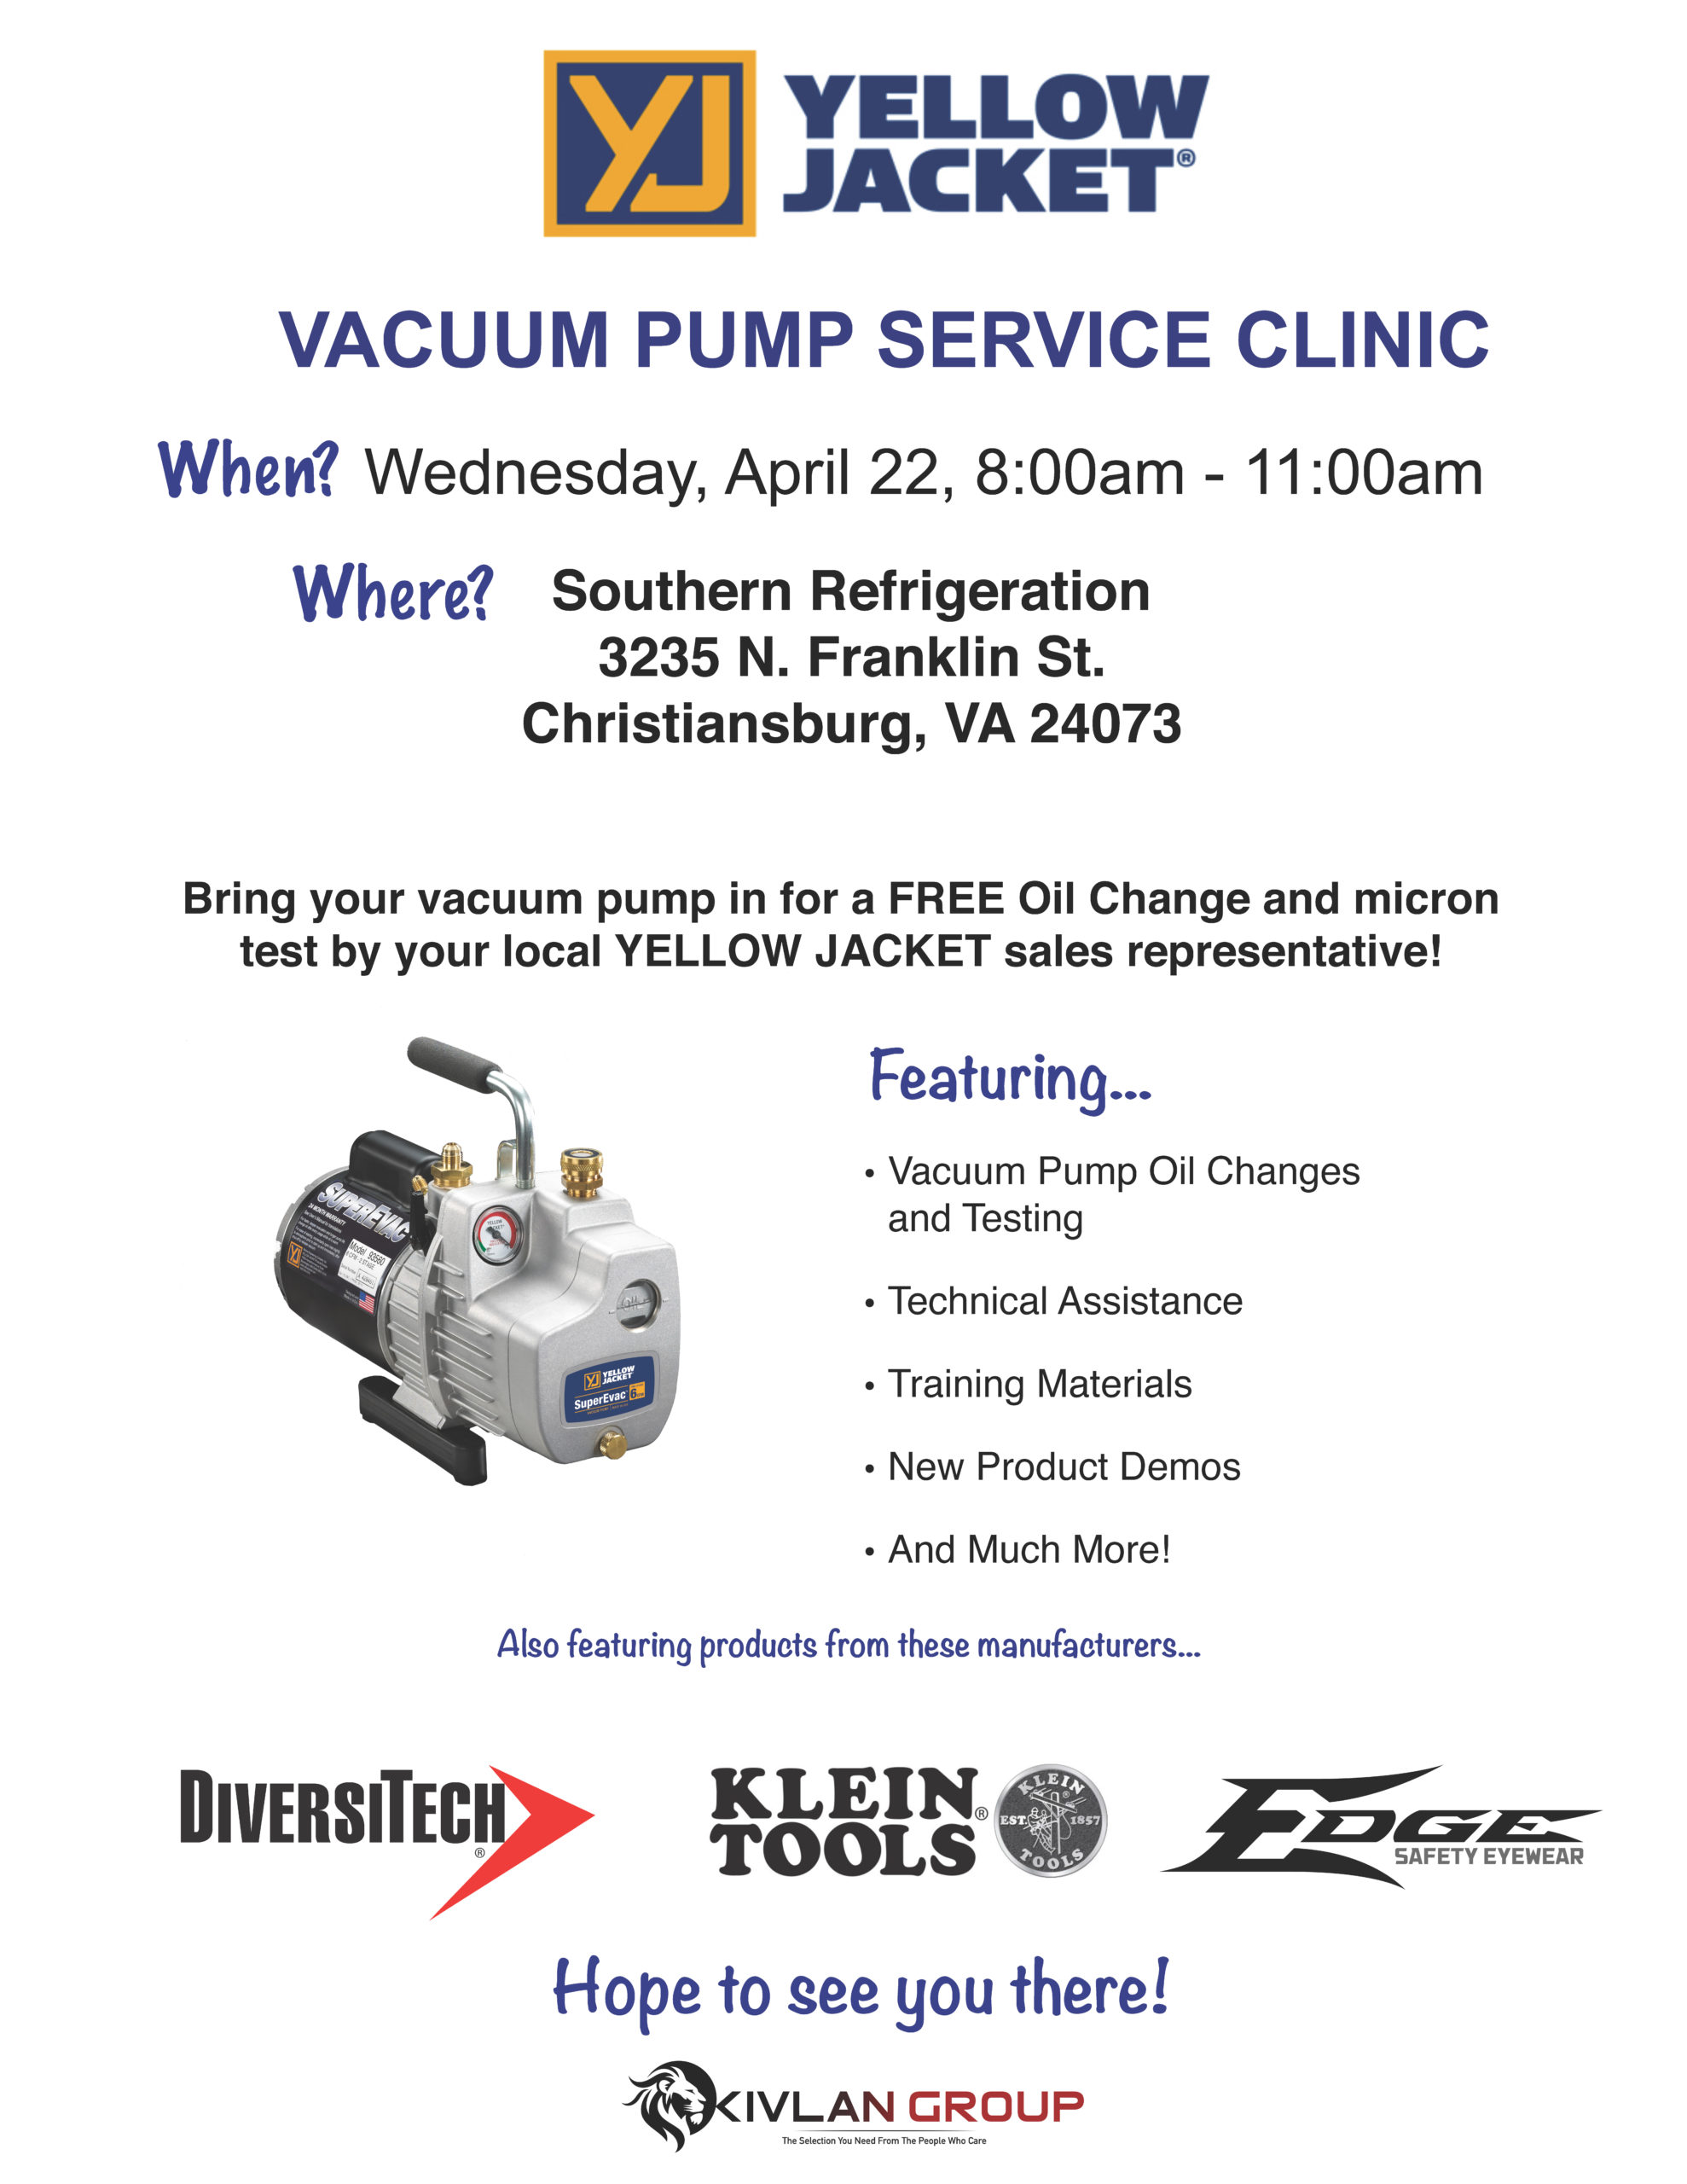 Yellow Jacket Vacuum Pump Service – Christiansburg @ Southern Refrigeration - Christiansburg